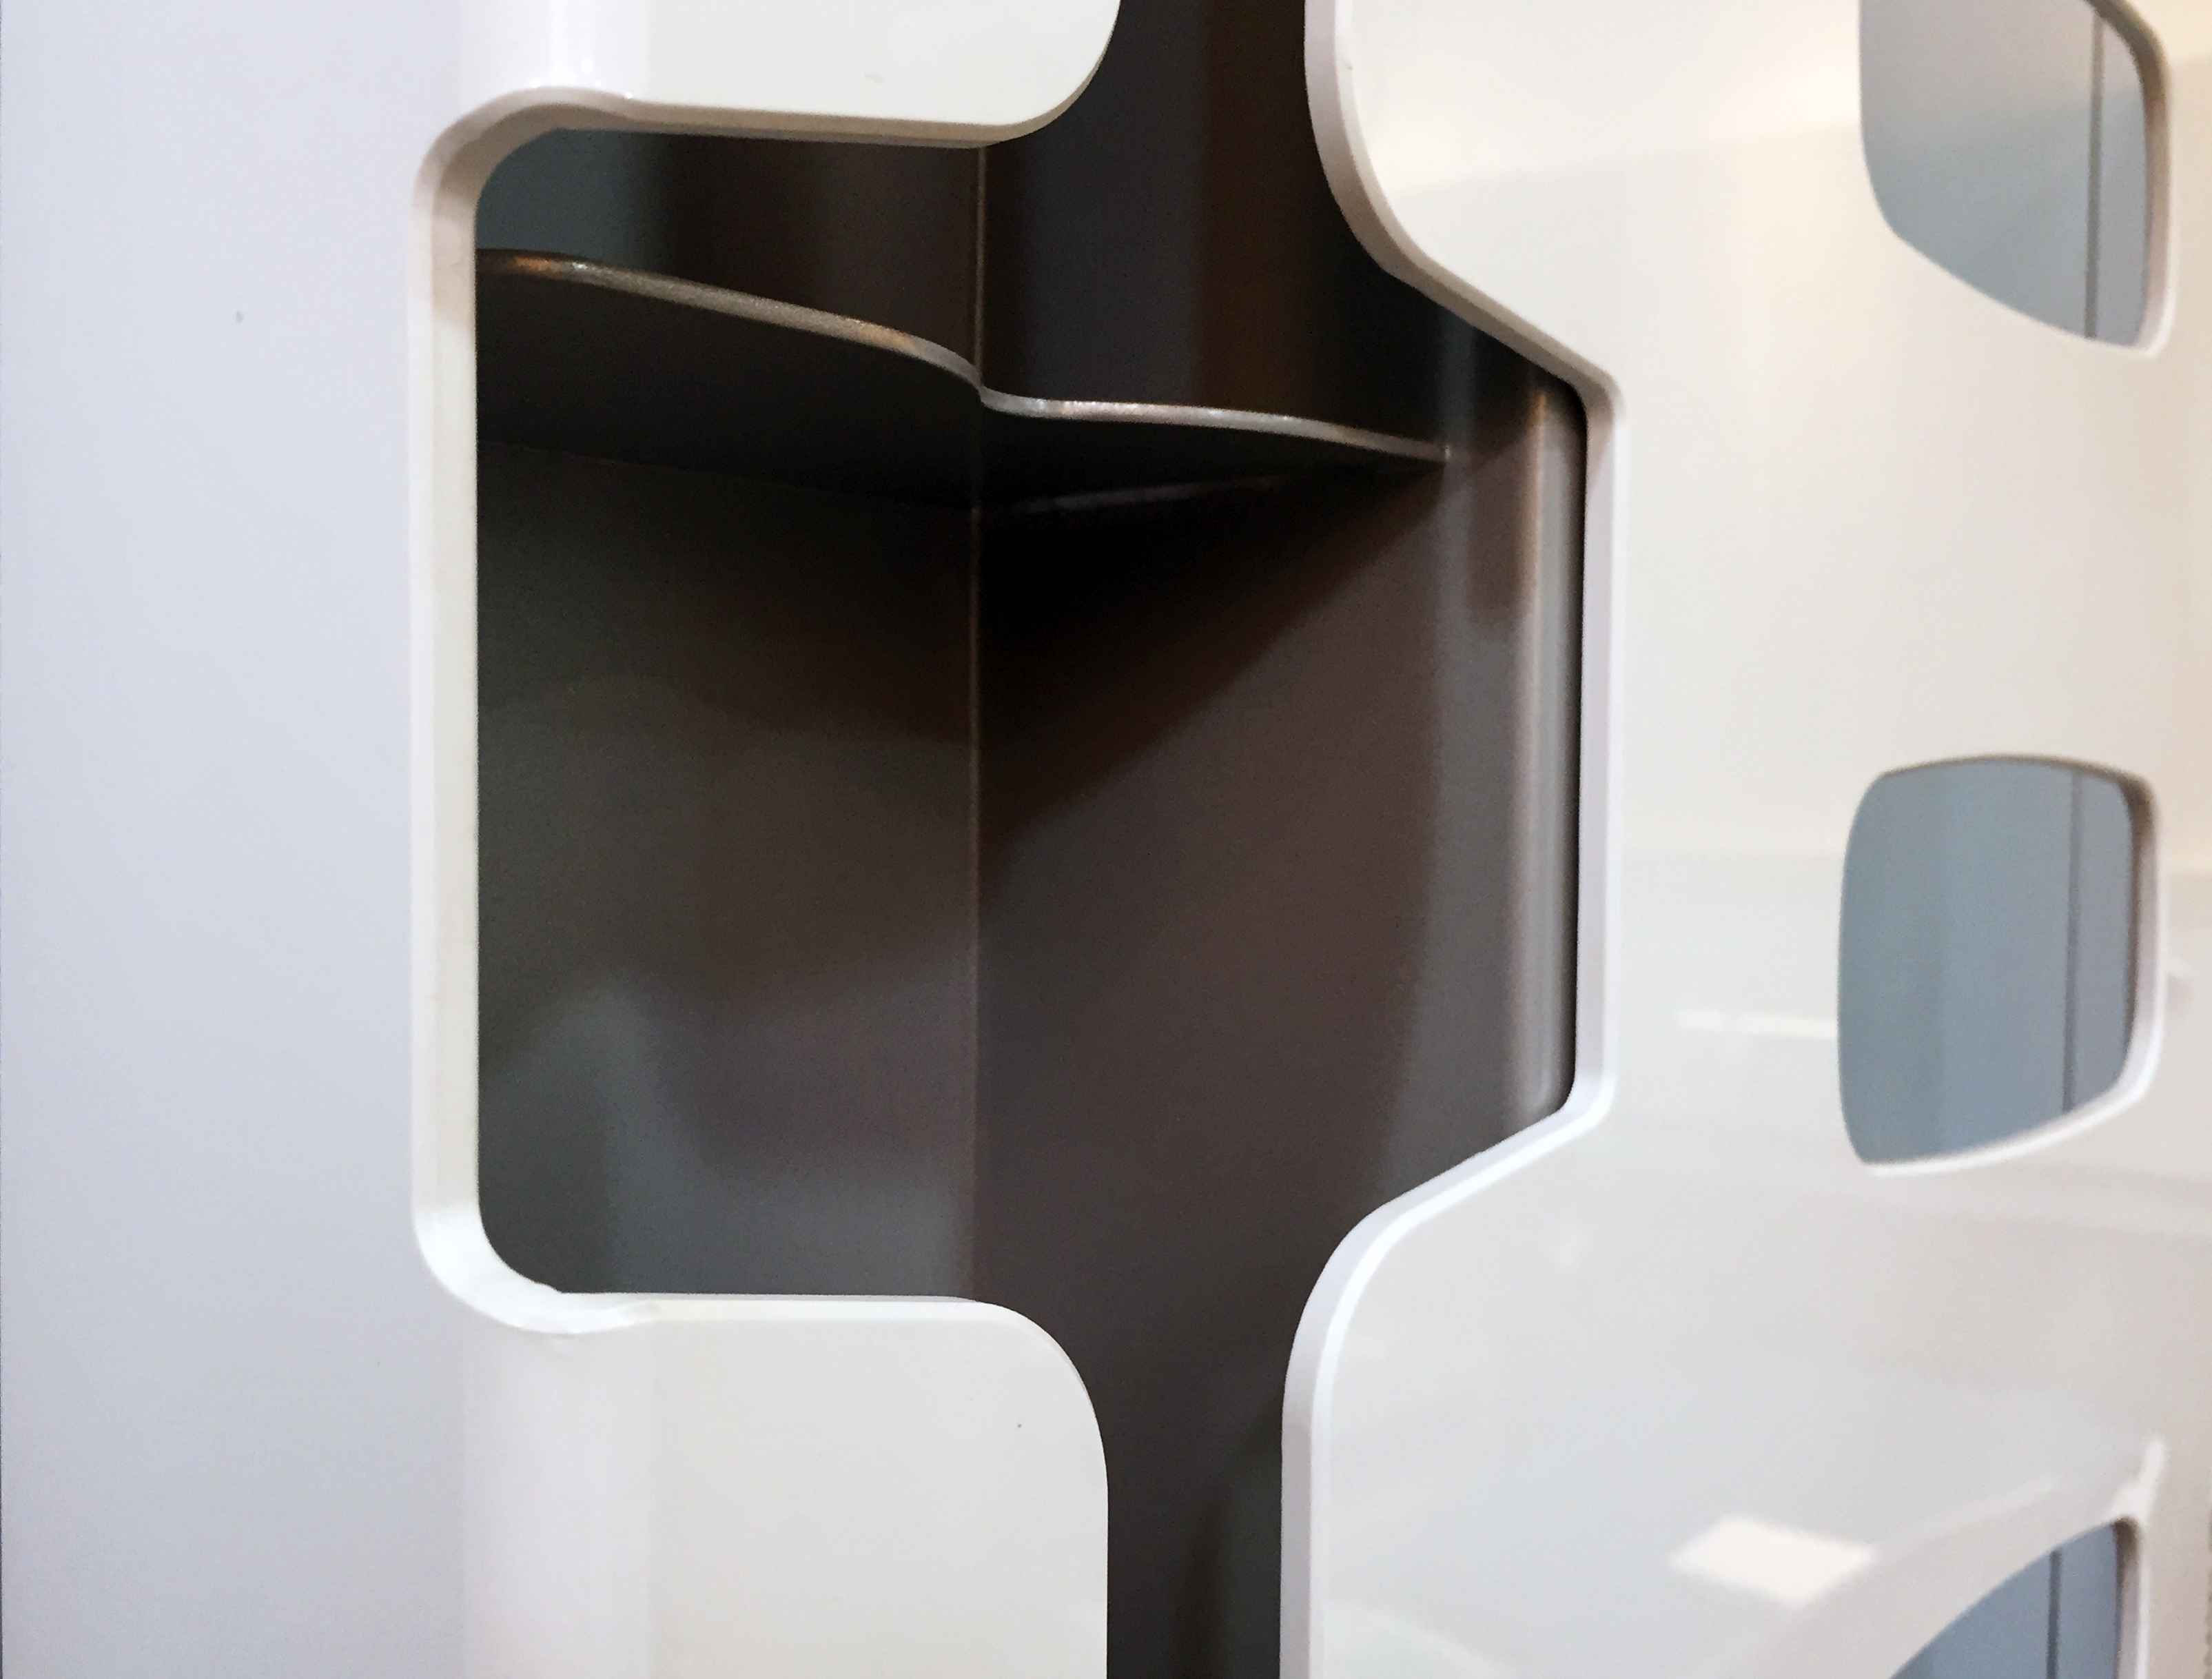 Wall Dispenser WD-04